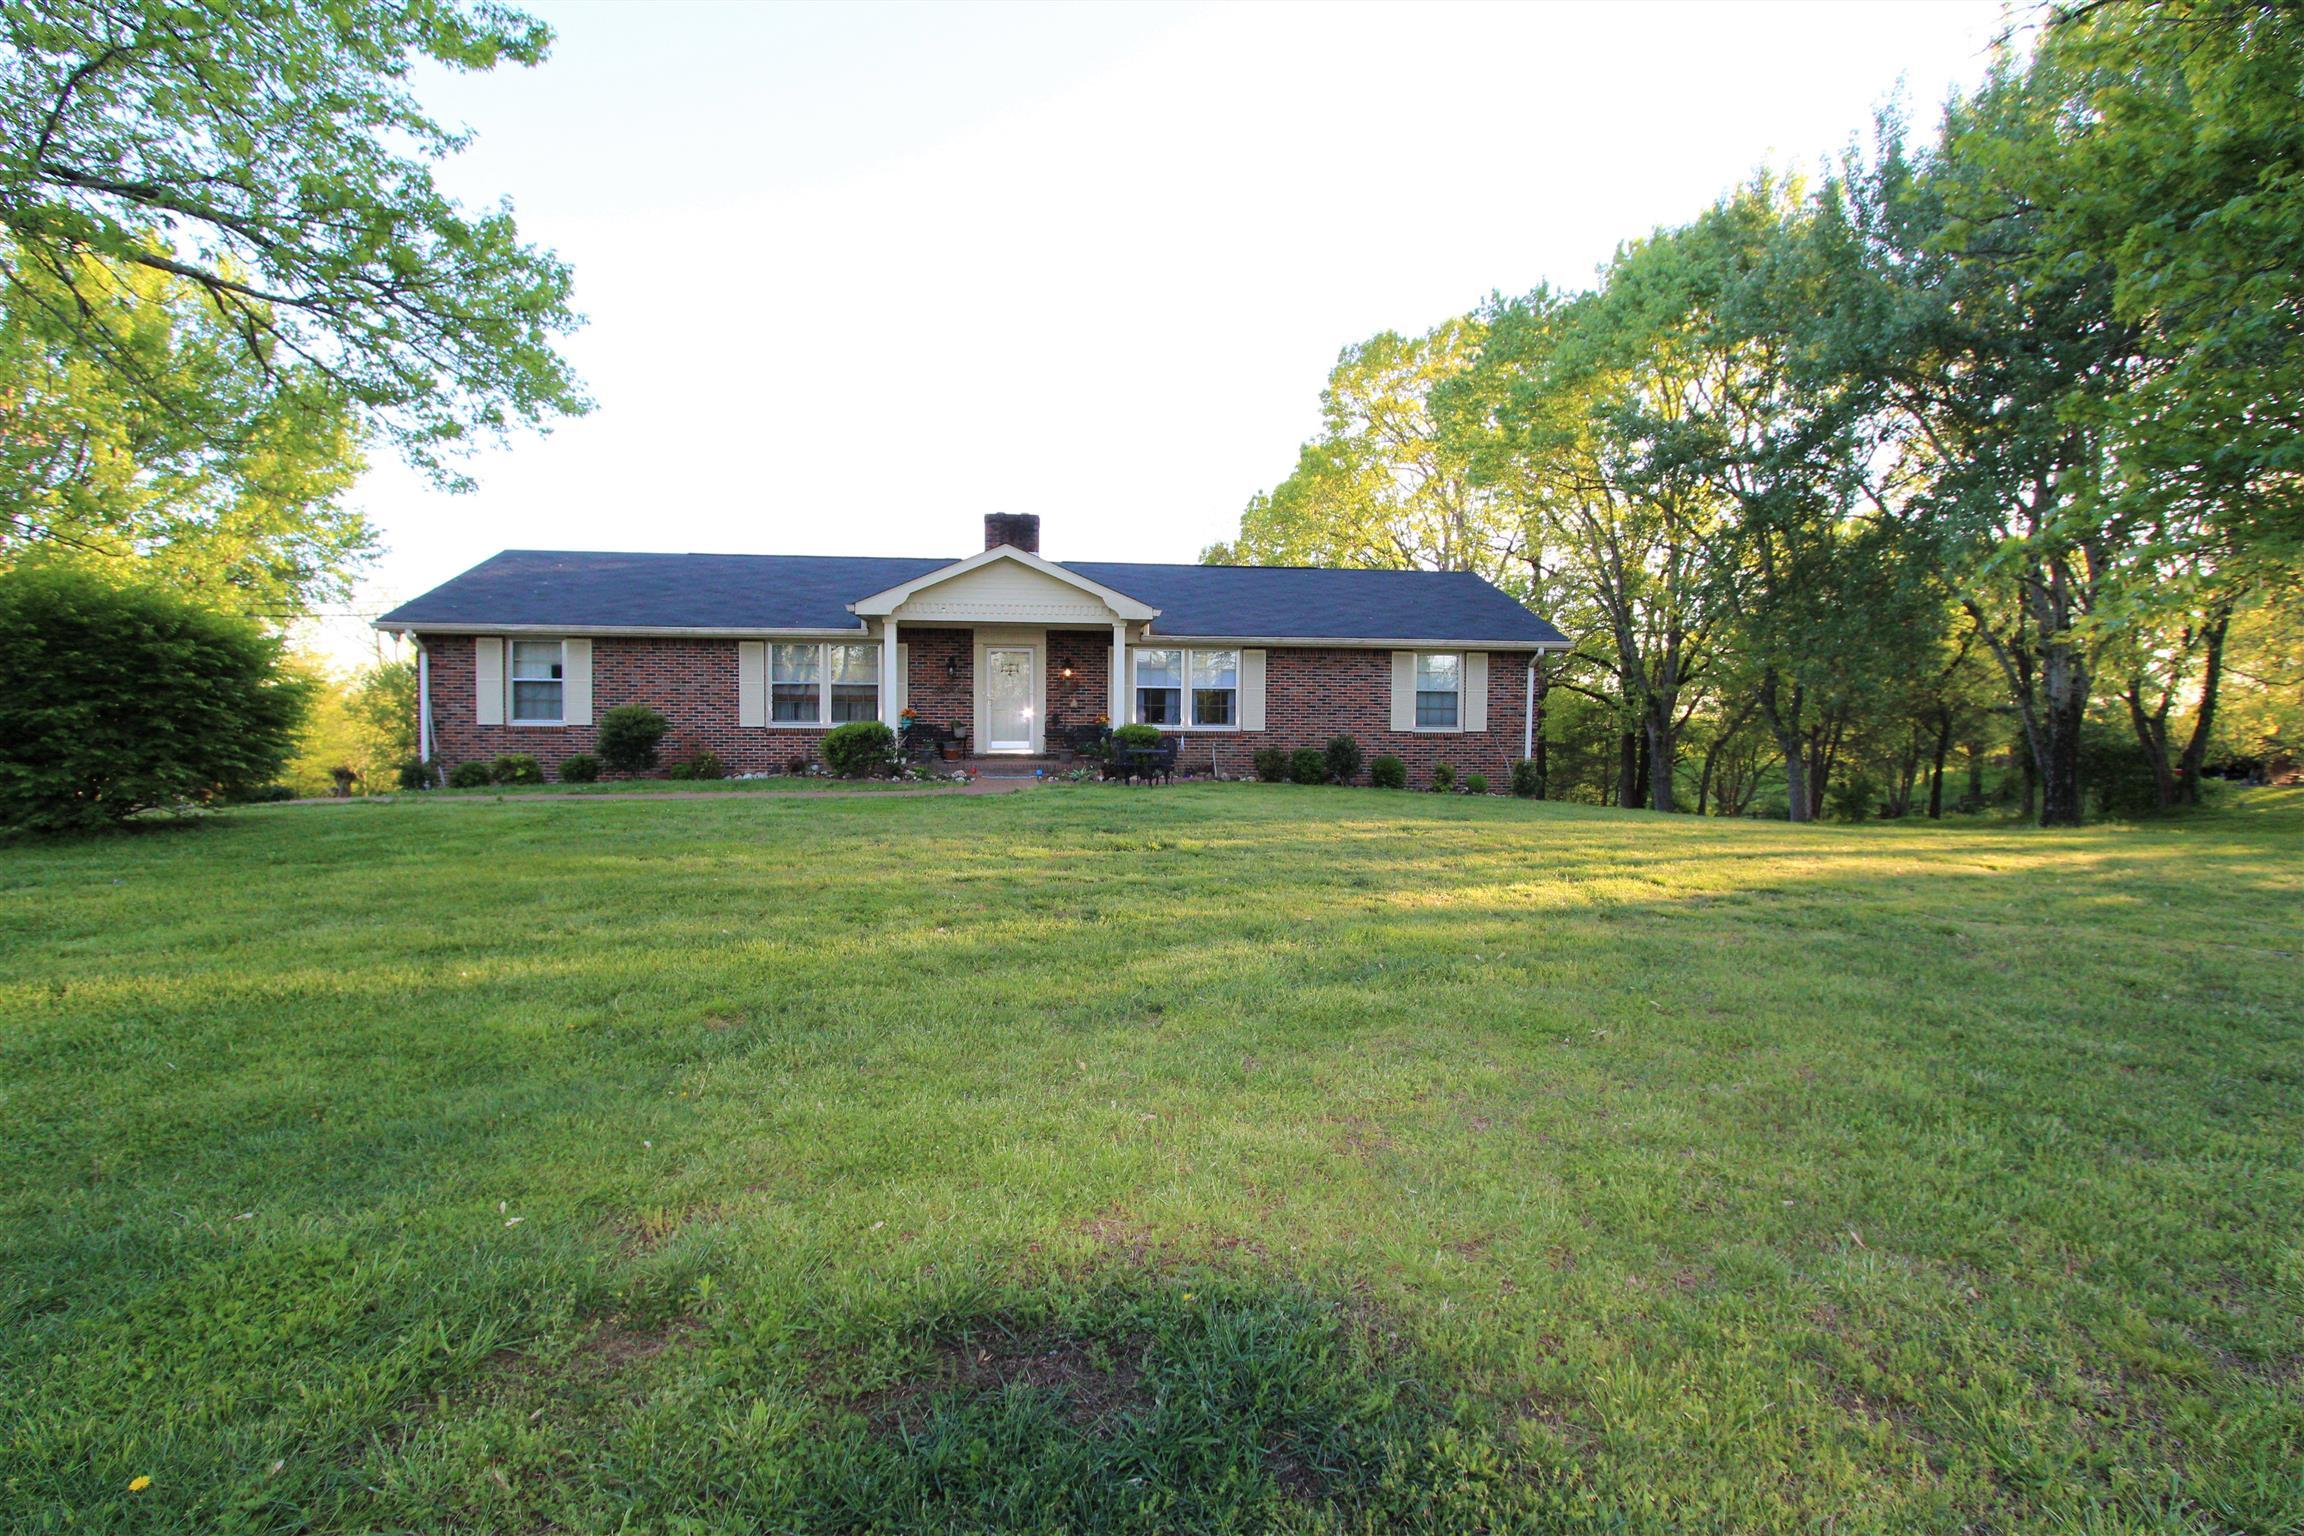 3392 Old Franklin Rd, Antioch, TN 37013 - Antioch, TN real estate listing